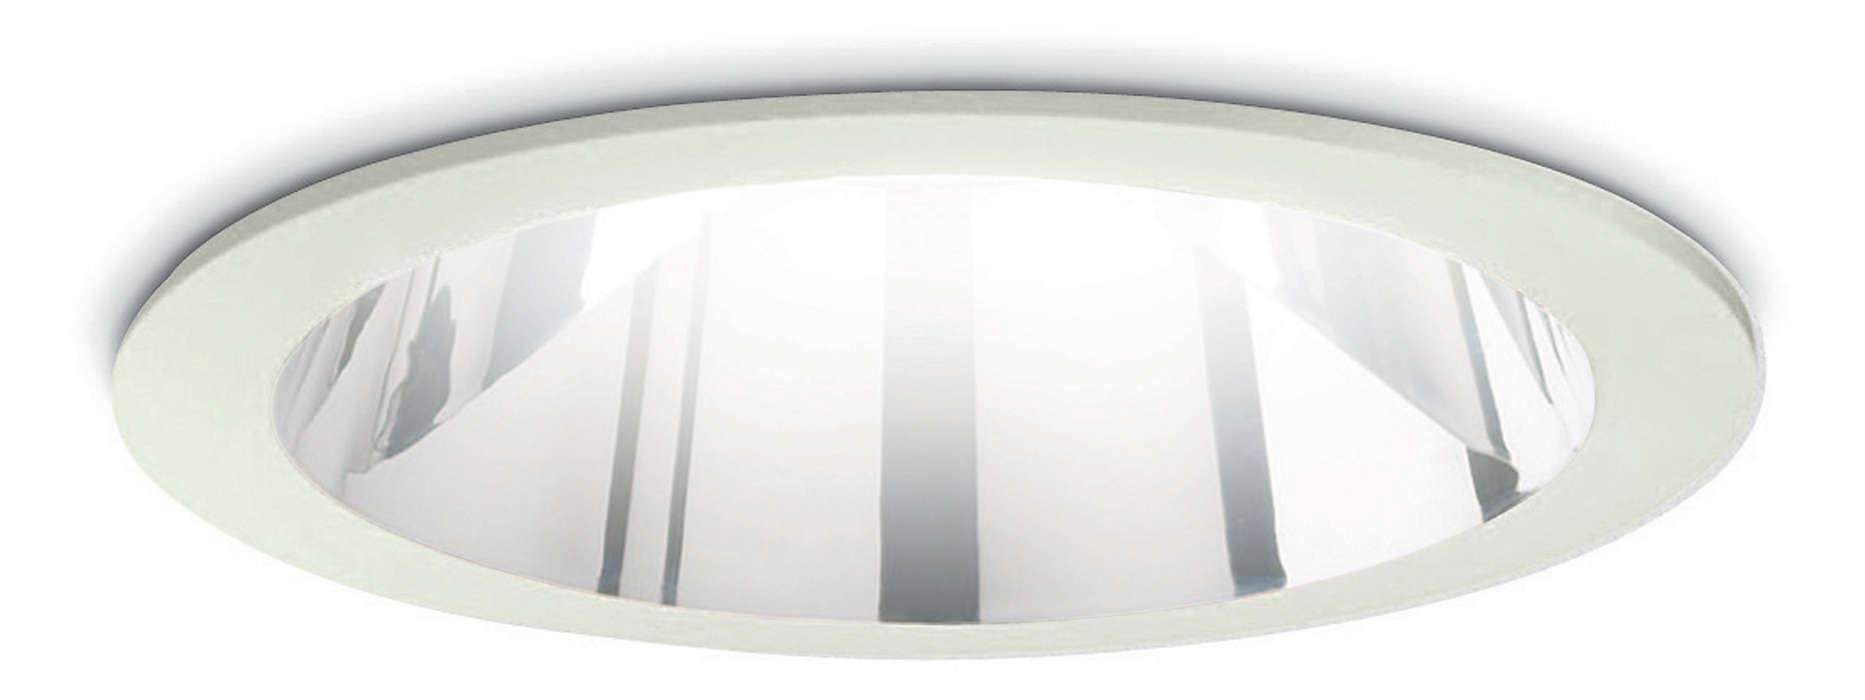 Fugato Compact Общее освещение